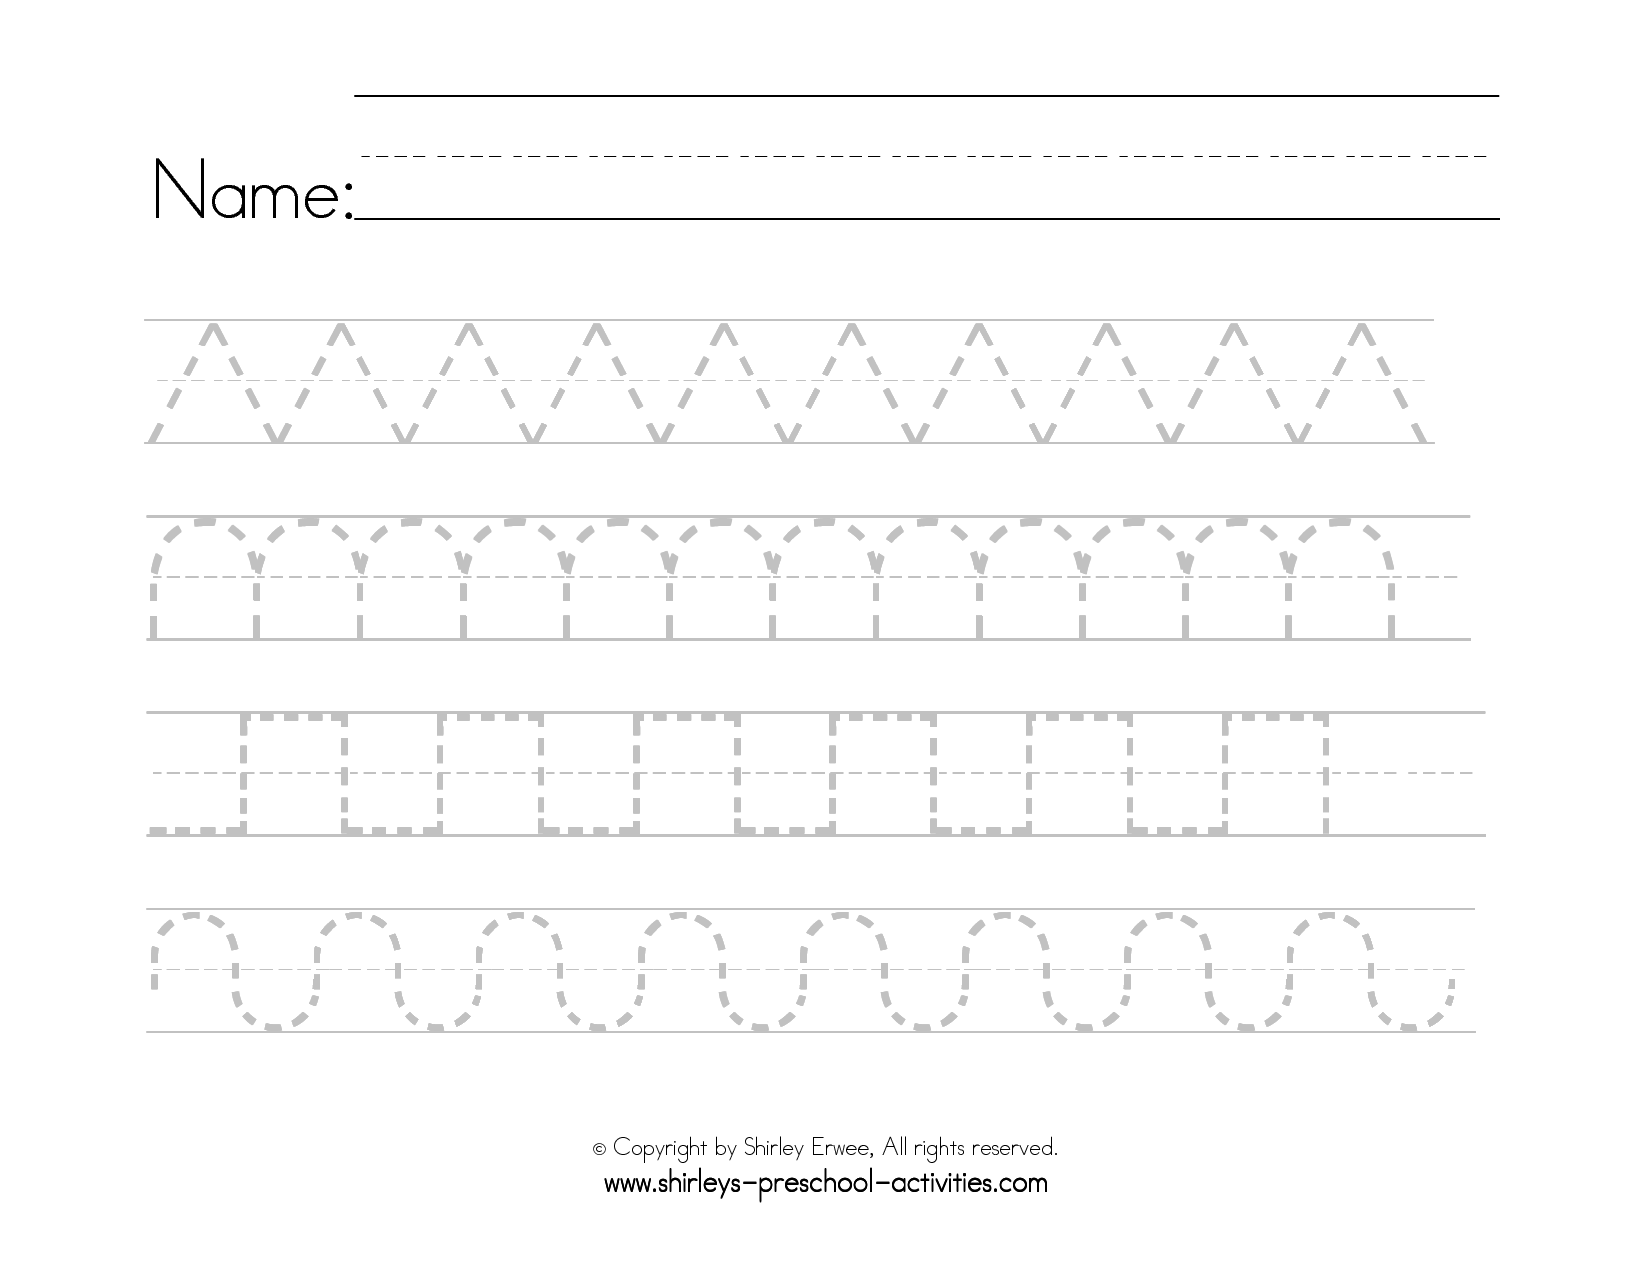 Handwritingrksheets For Preschool Name Free Children inside Name Tracing Pattern Cursive